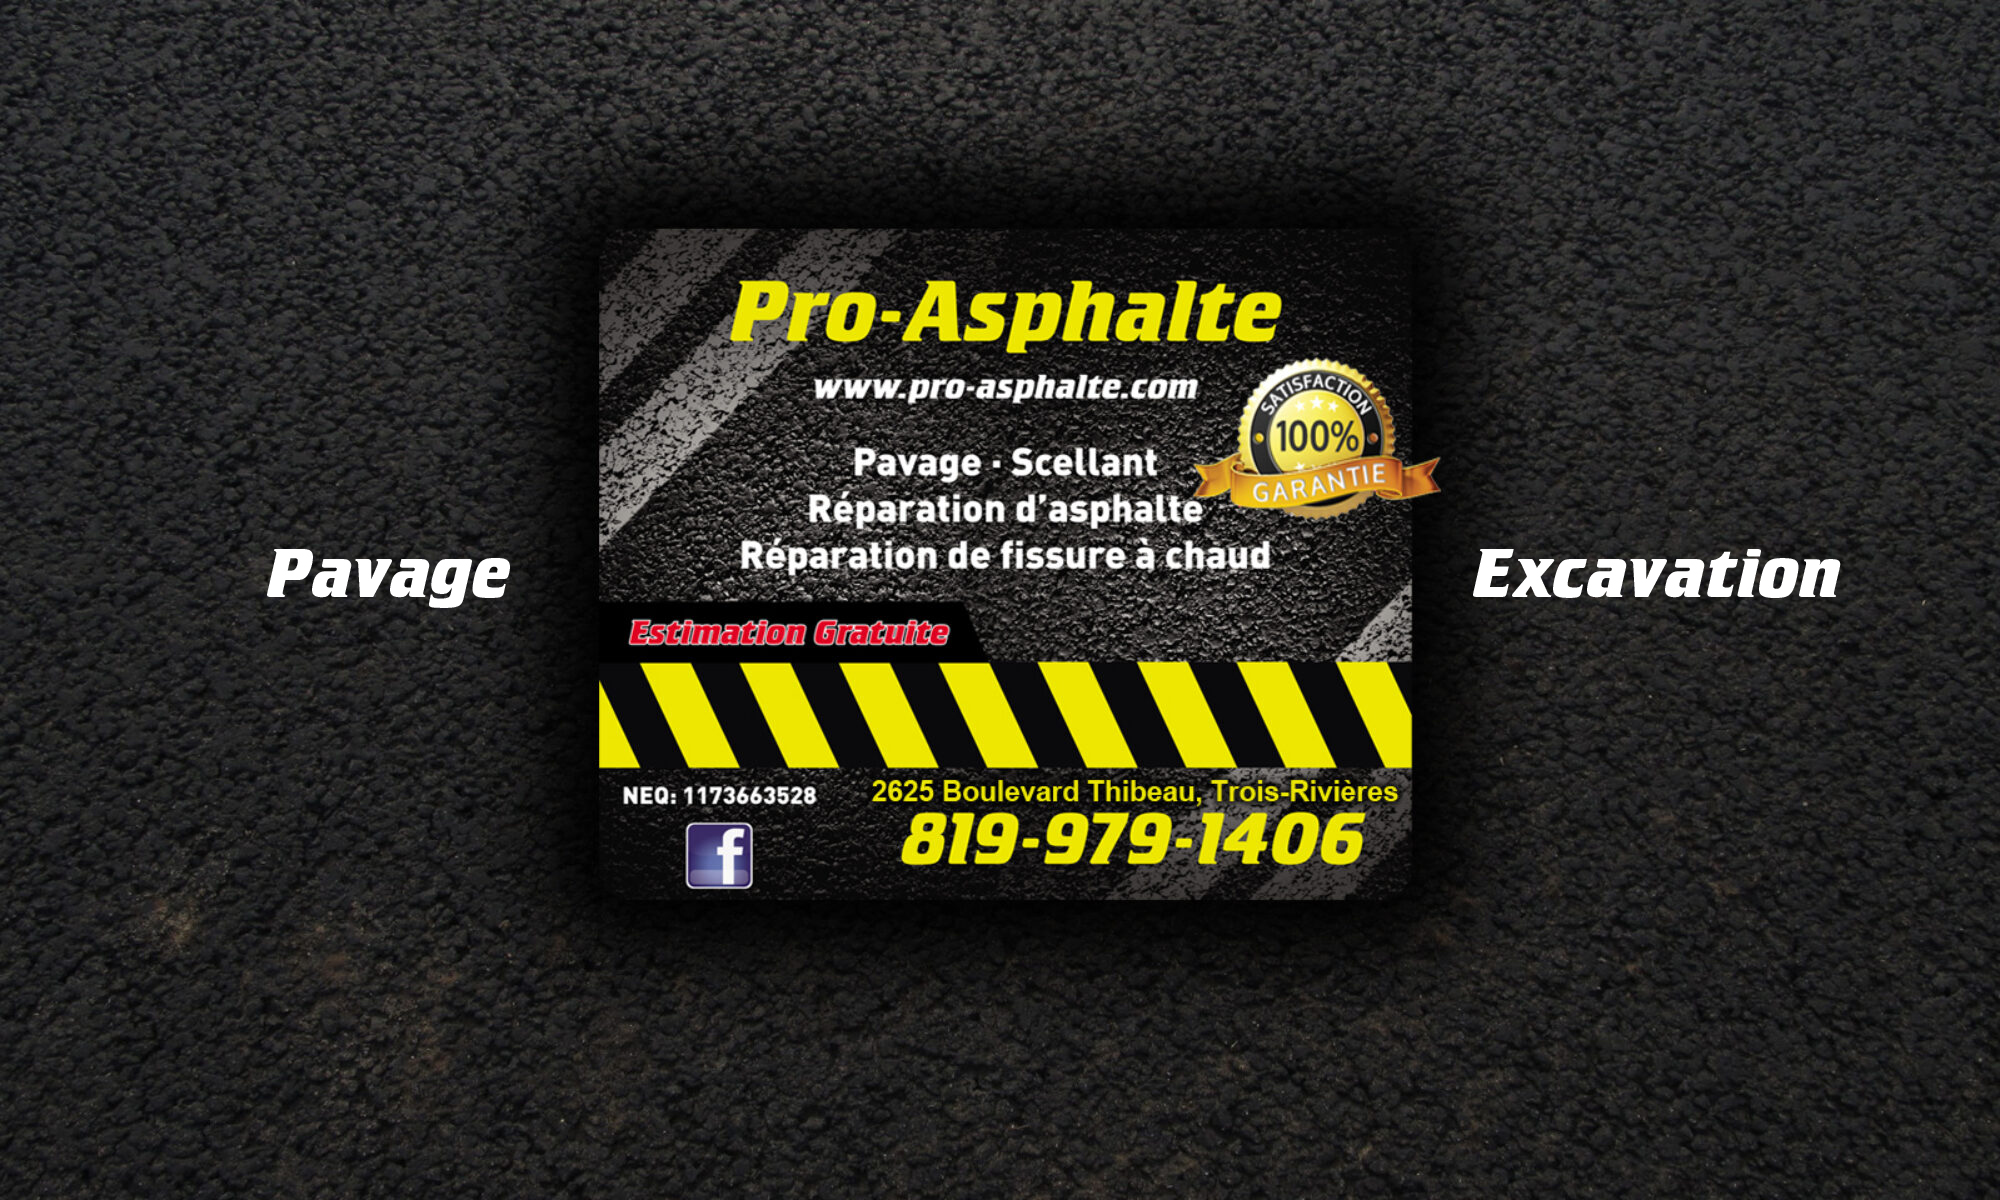 Pro-asphalte